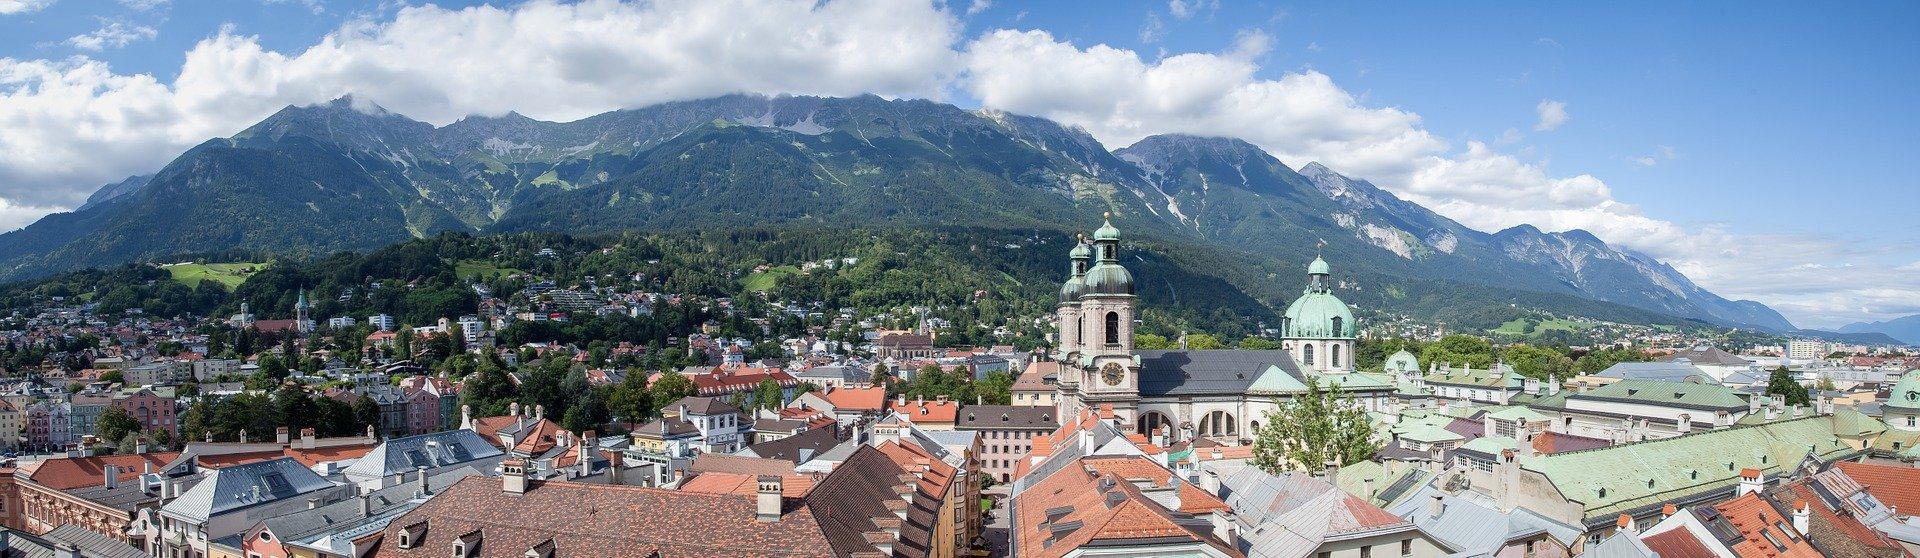 Wedding Venues Wedding Venues Tyrol